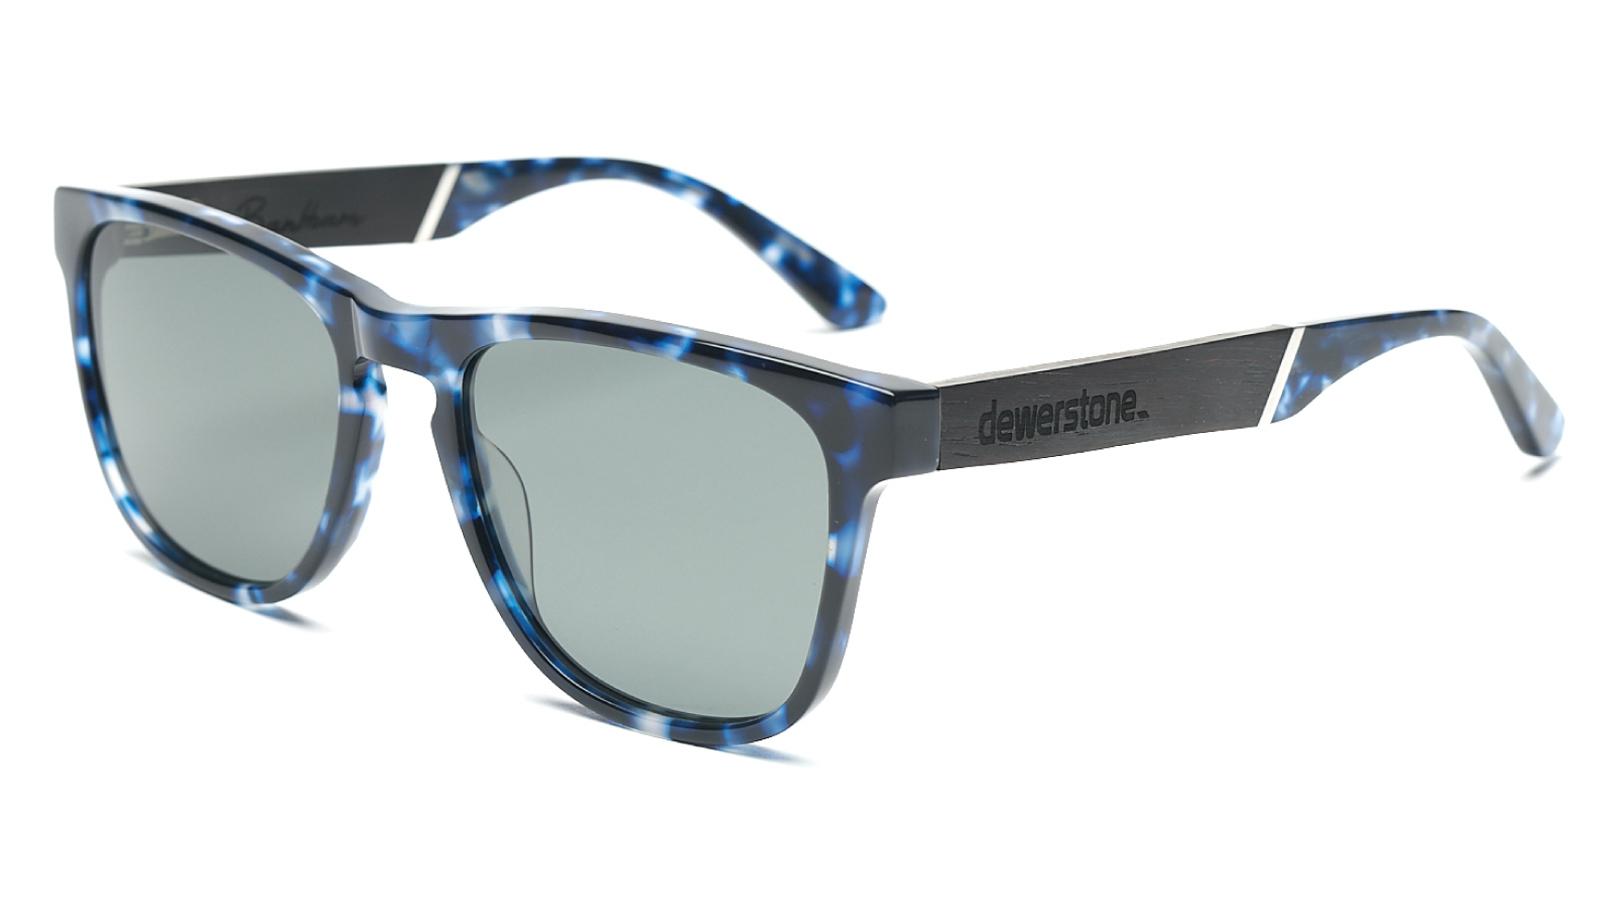 Dewerstone SS21 Sunglasses